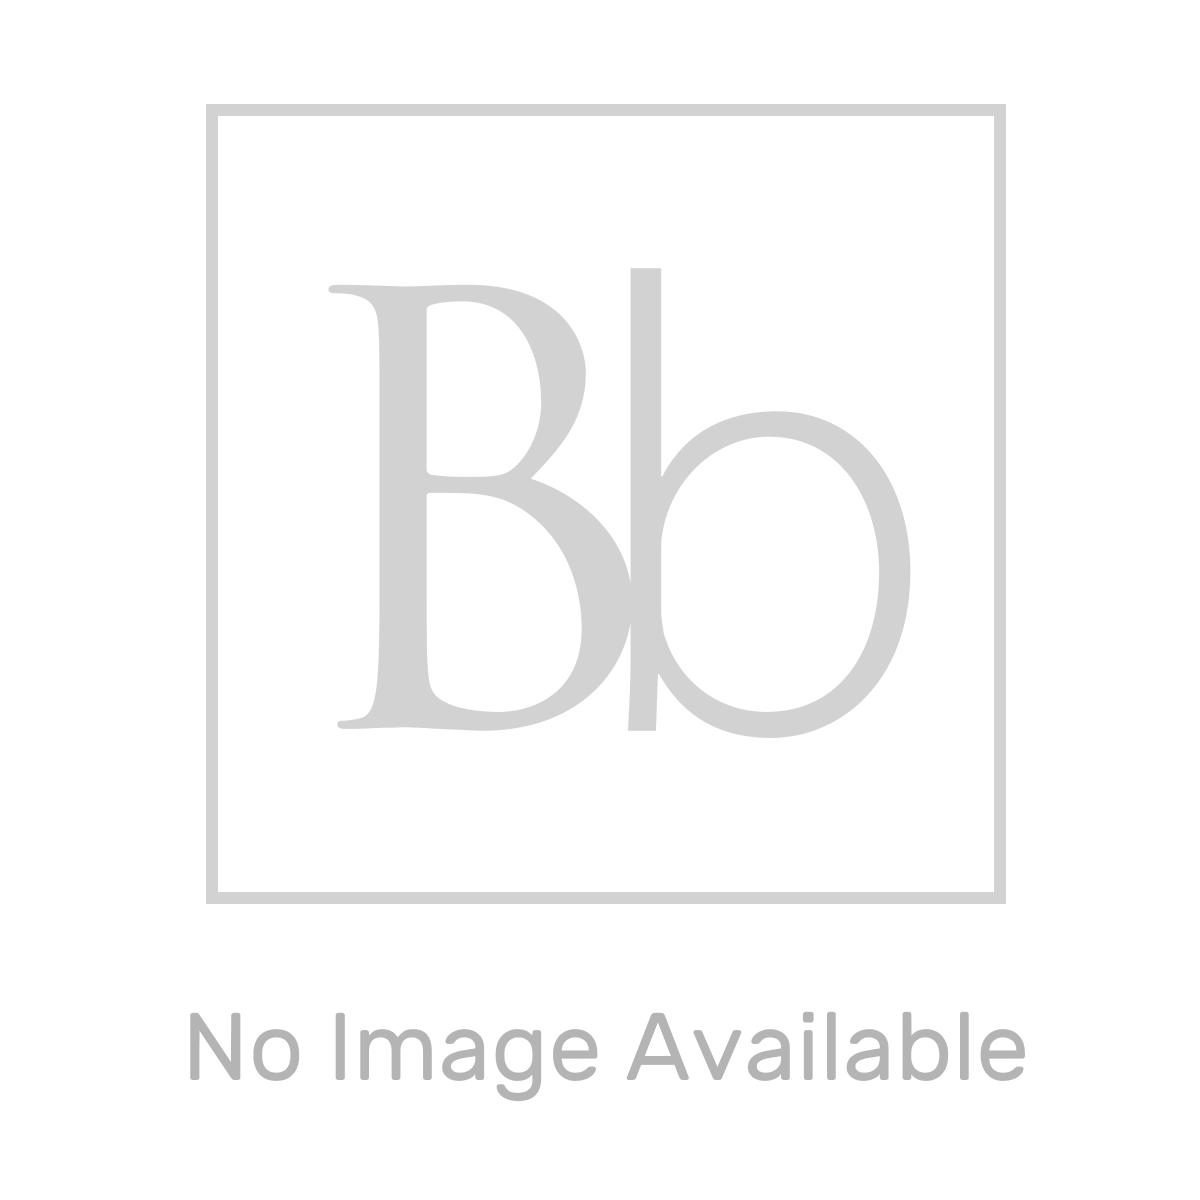 Stuart Turner 46503 Showermate Eco Standard Single 2.0 Bar Pump Left